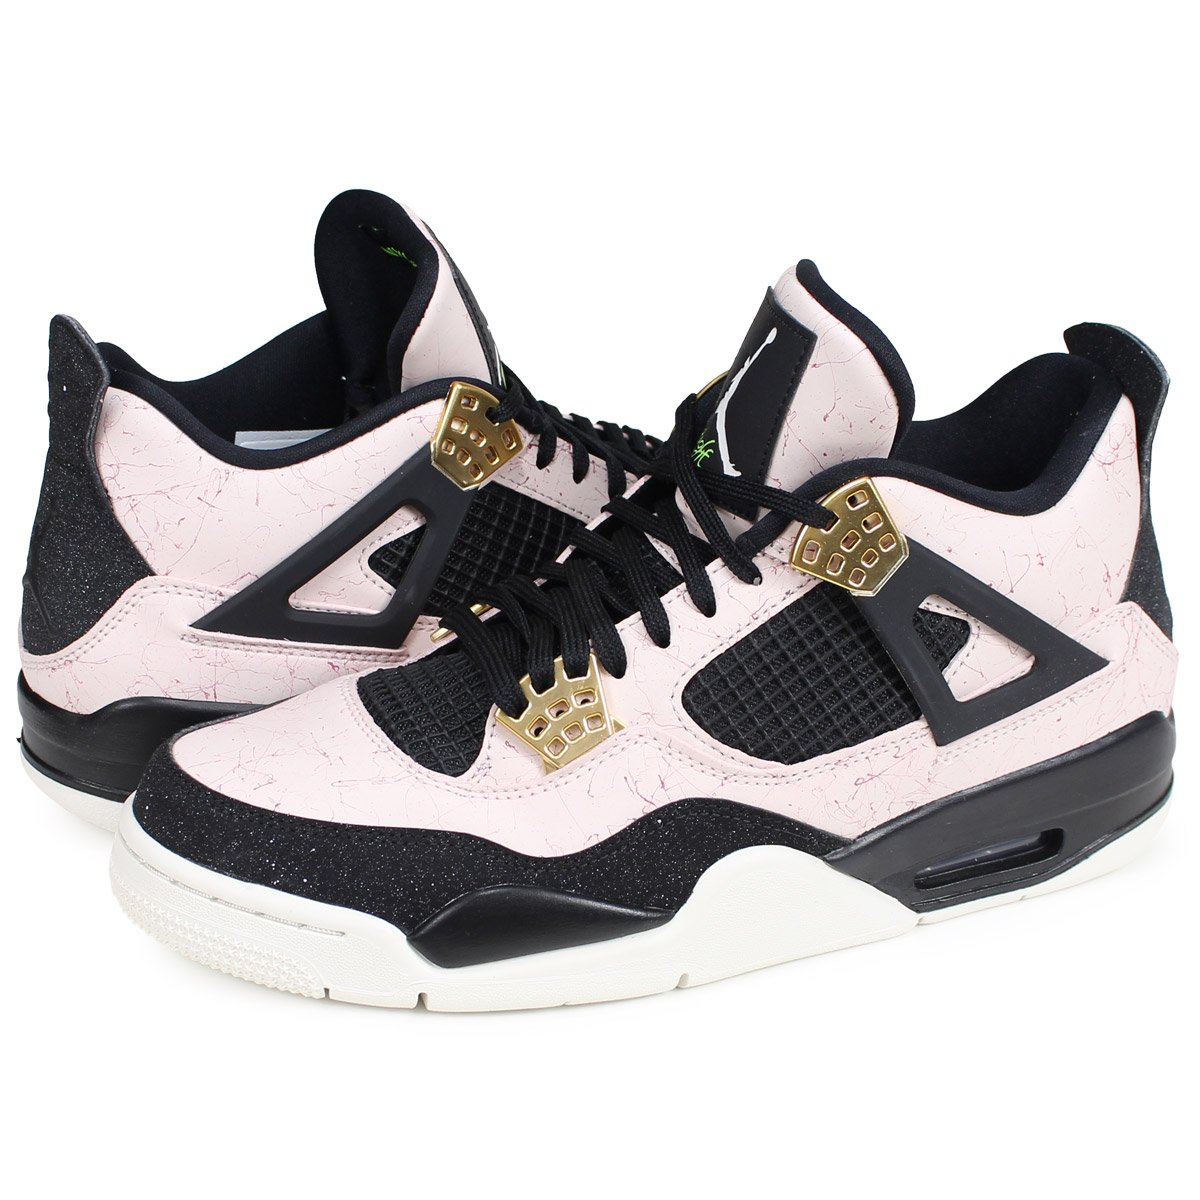 f8d2d954f7f4 Nike NIKE Air Jordan 4 nostalgic sneakers men WMNS AIR JORDAN 4 RETRO pink  AQ9129-601  2 25 Shinnyu load   192